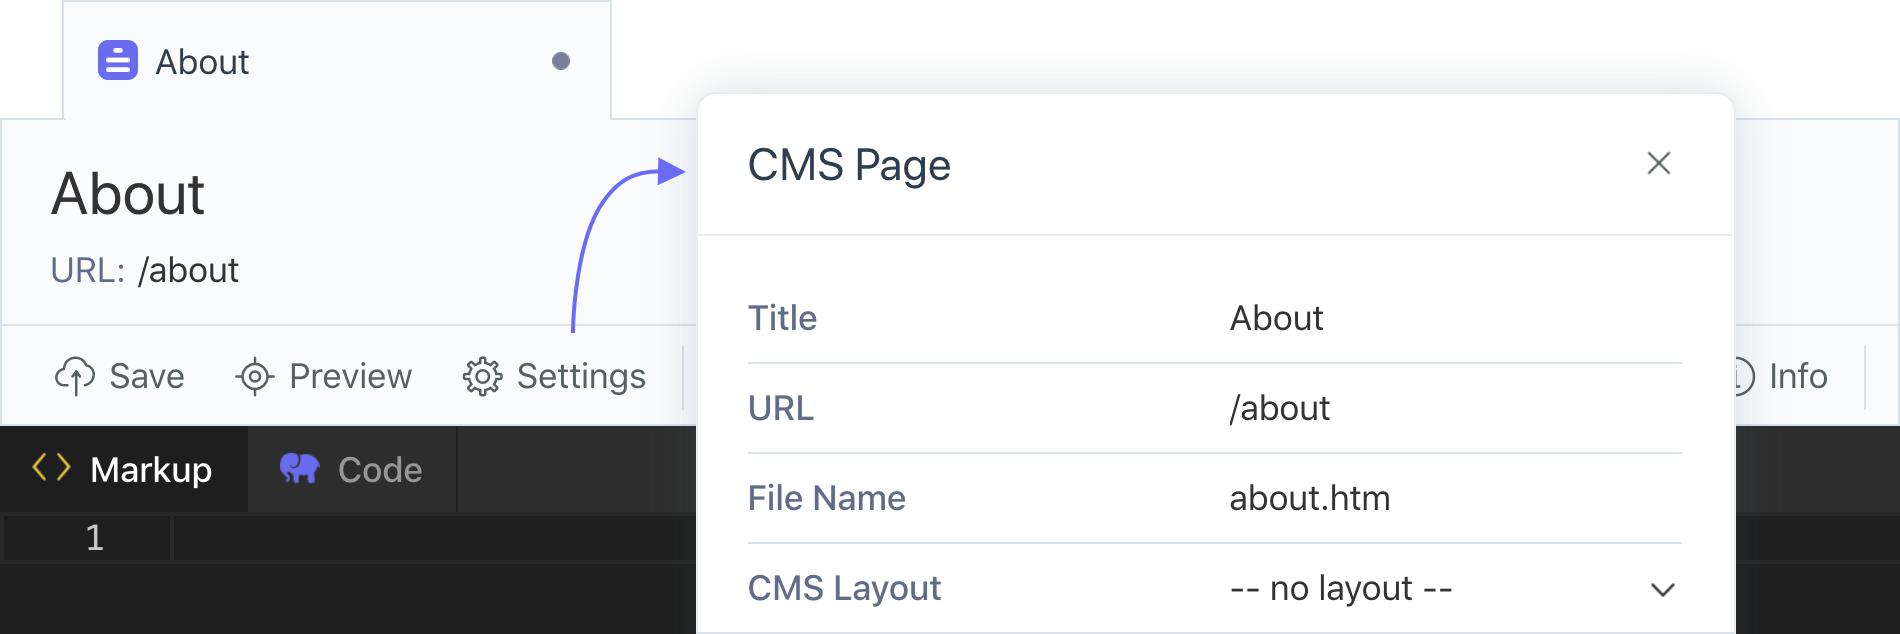 editor-toolbar-popup@2x.png